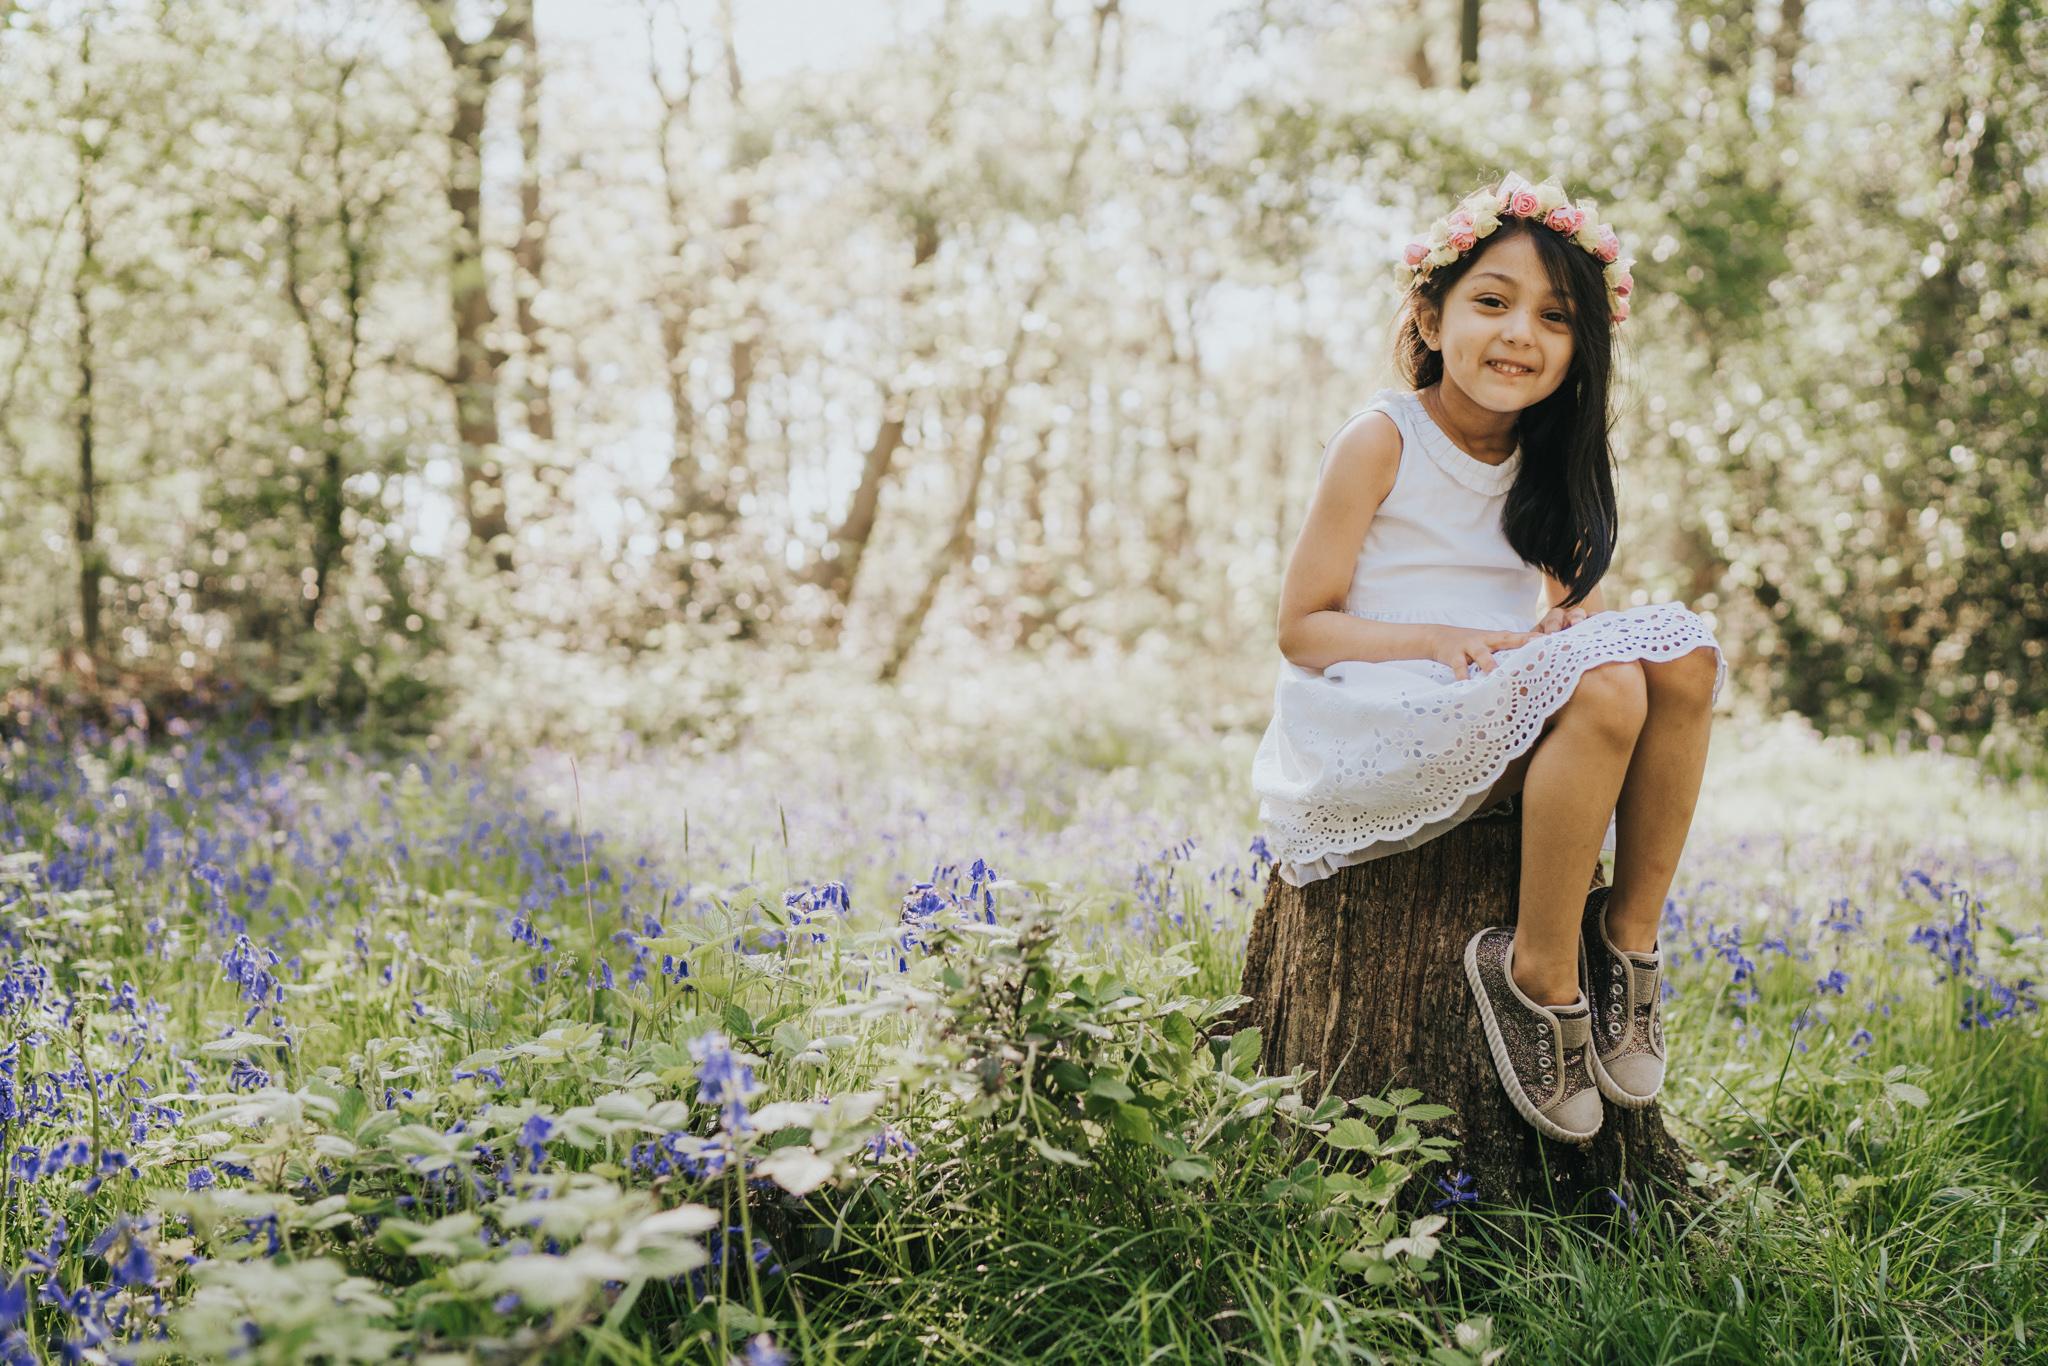 Chandrasiri-Family-Session-Woodland-Colchester-Essex-Grace-Elizabeth-Alternative-Wedding-Photographer (1 of 1).jpg (27 of 34).jpg